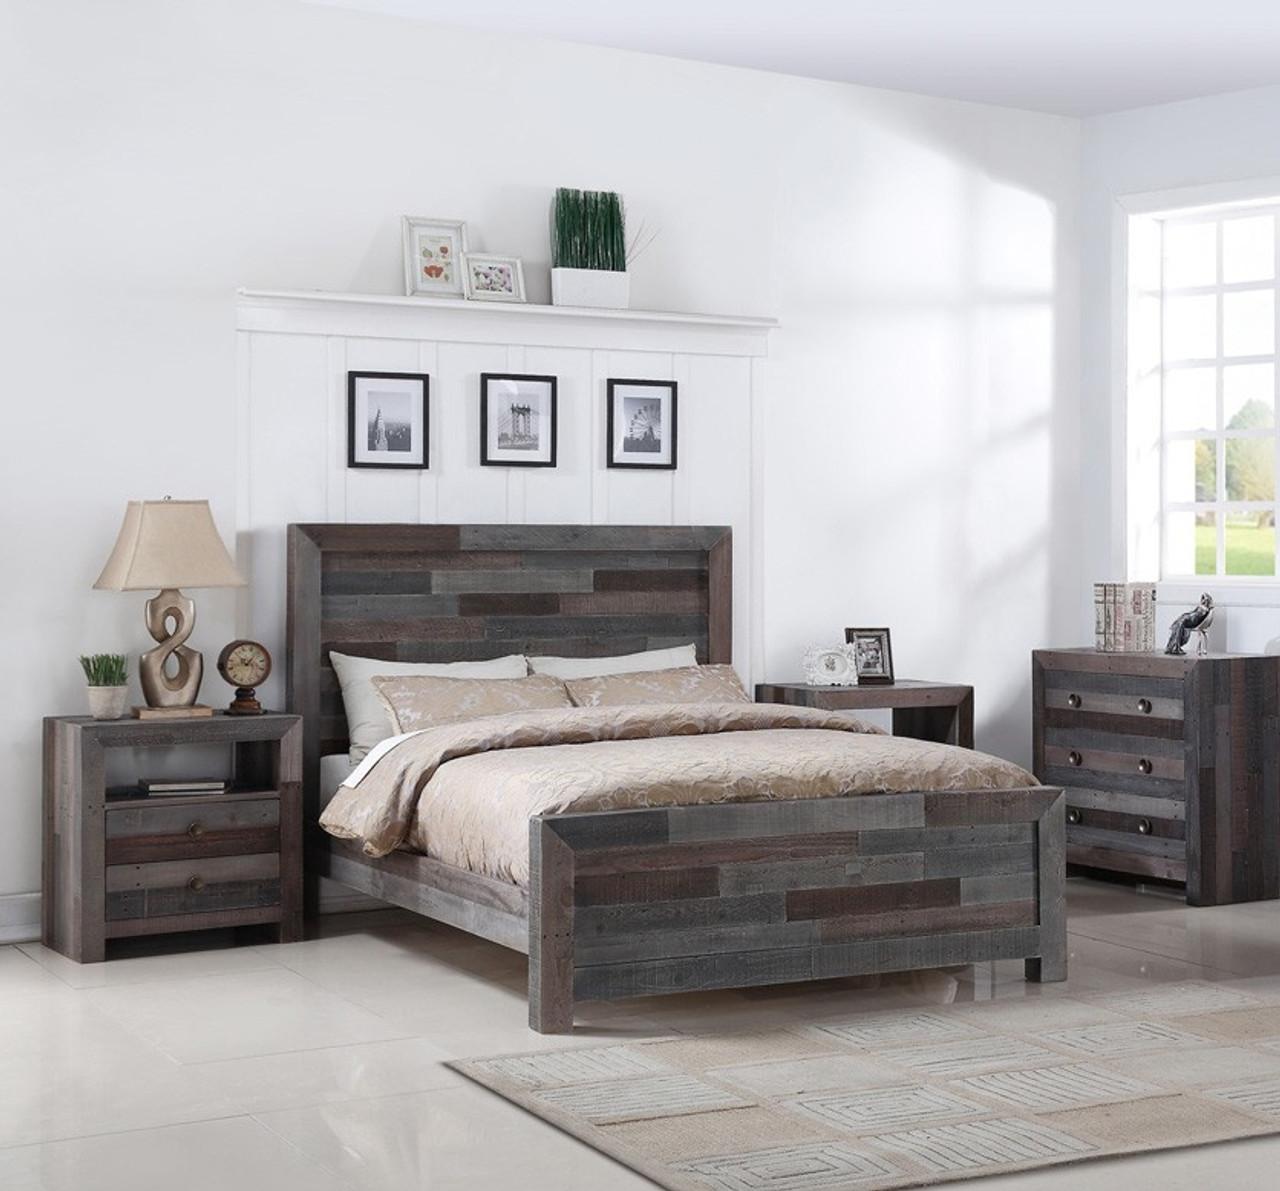 Modern Queen Size Platform Bed Frame Concept